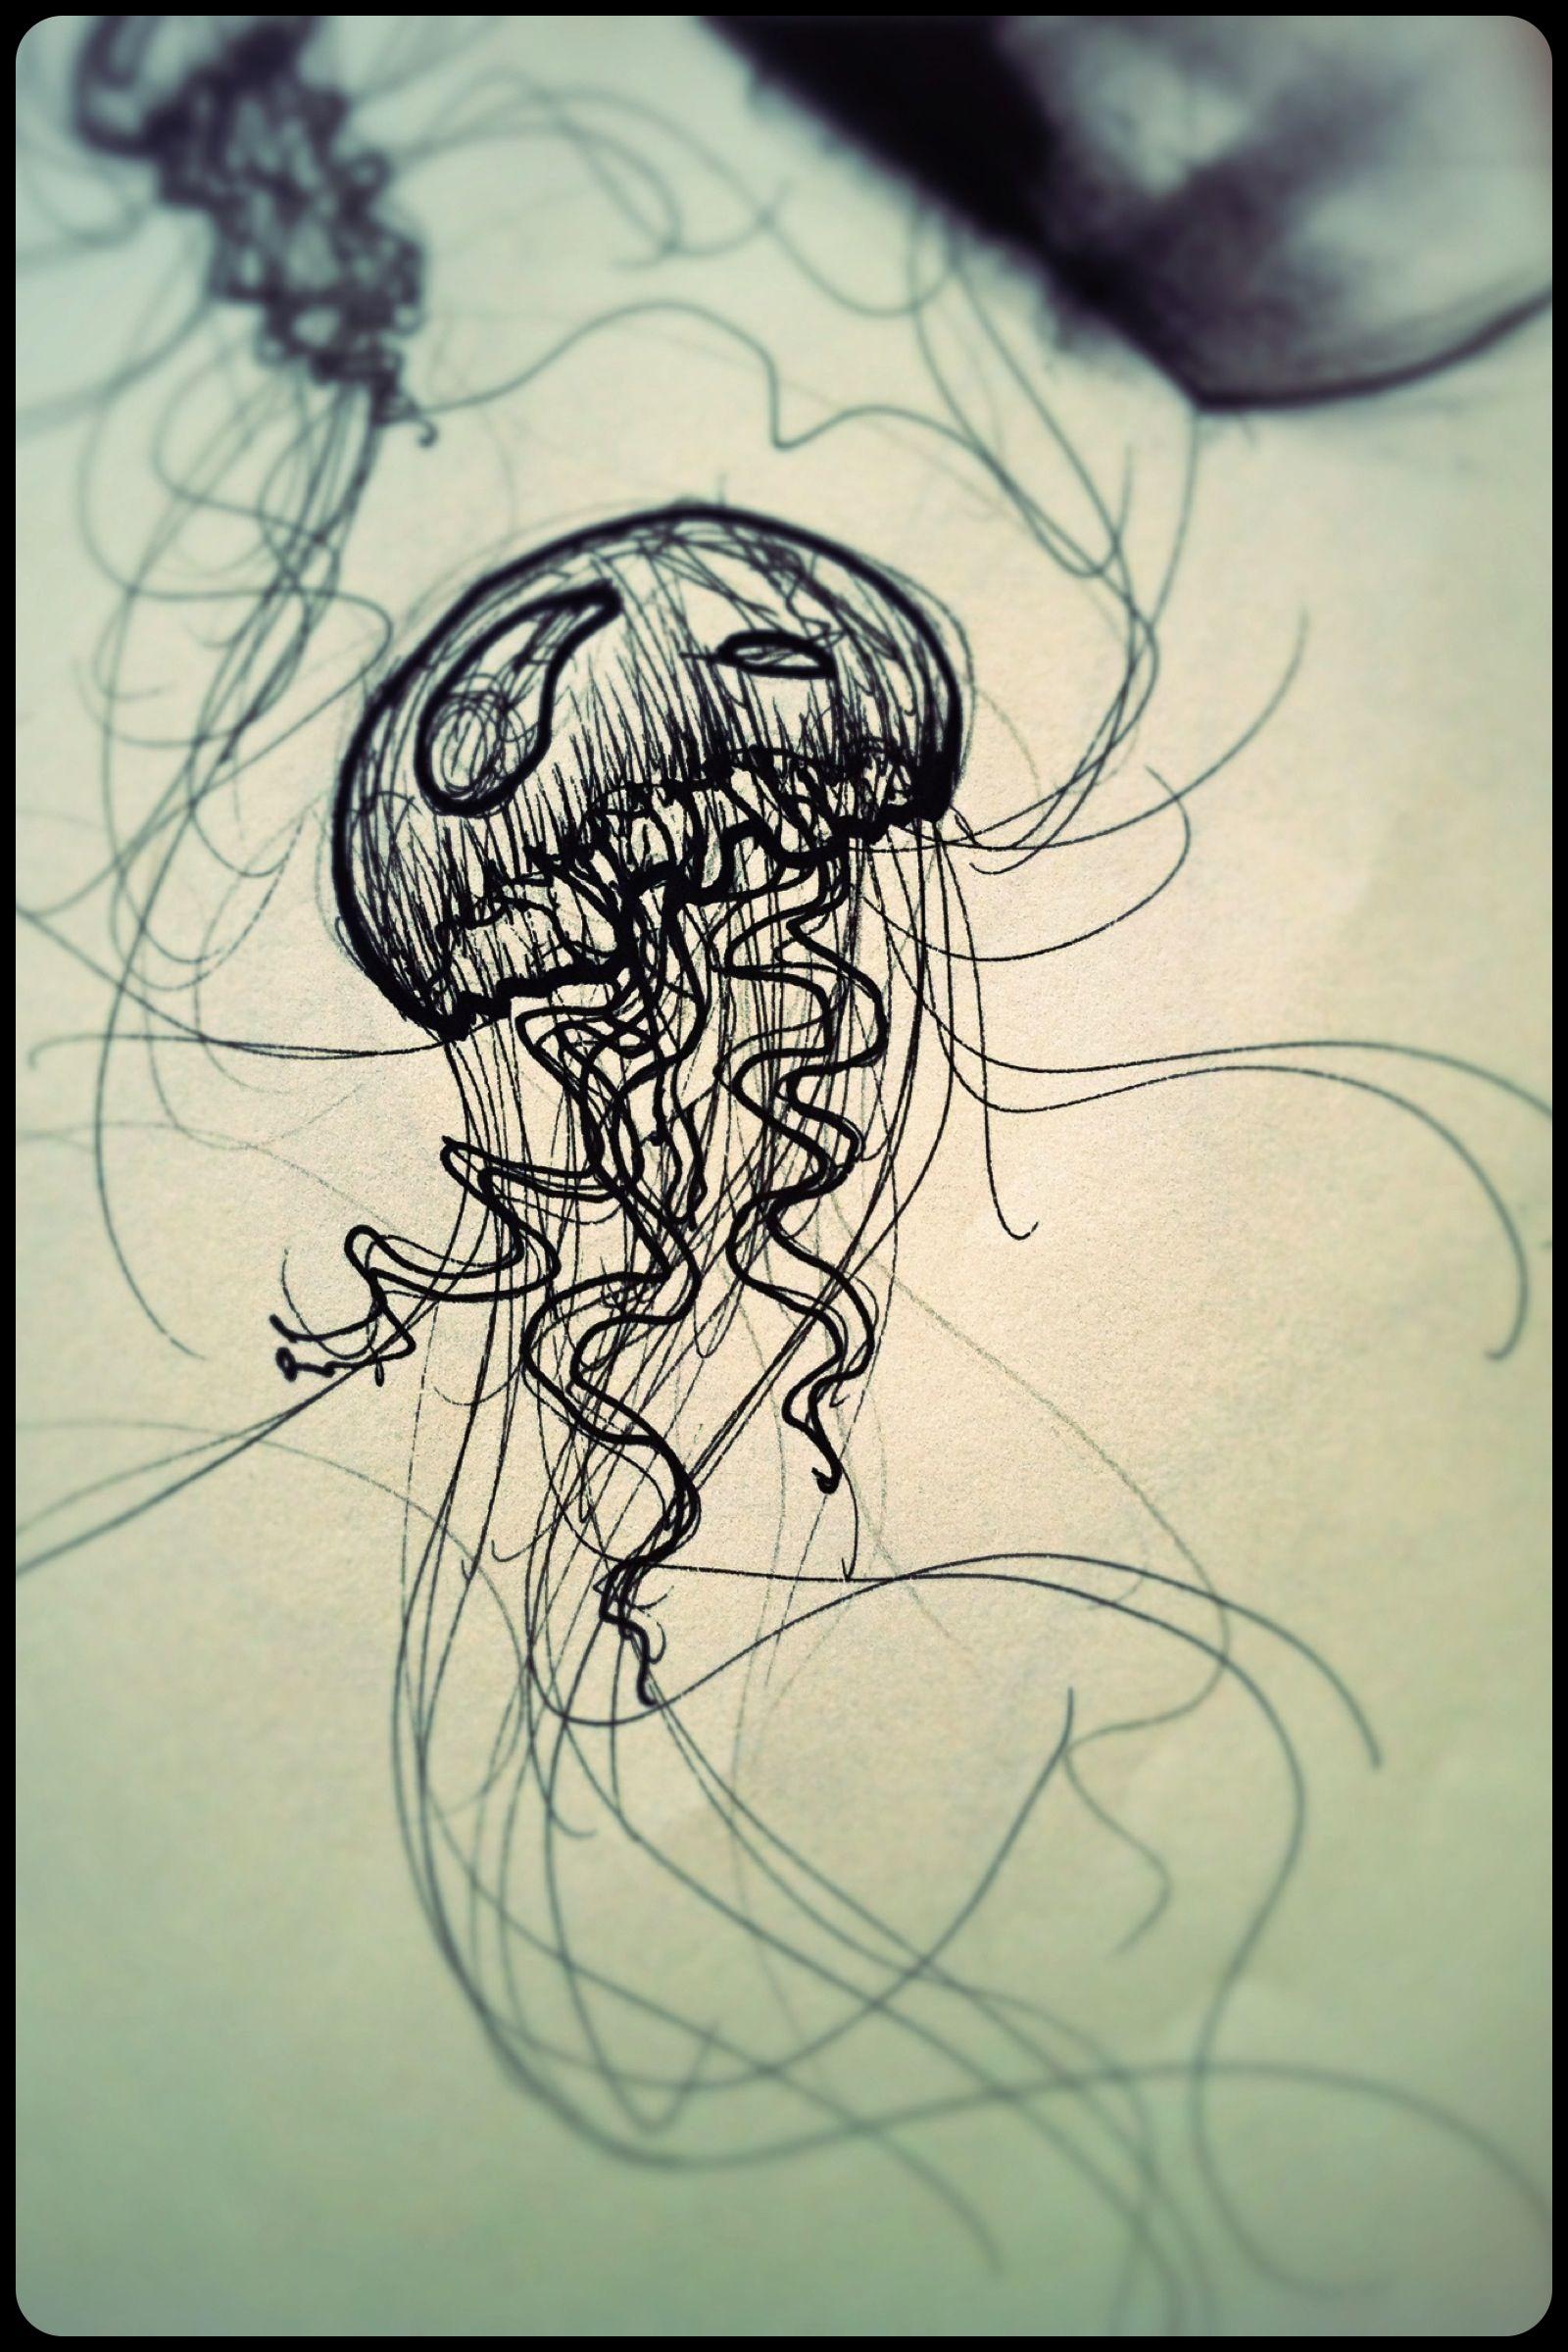 My quick jellyfish drawing